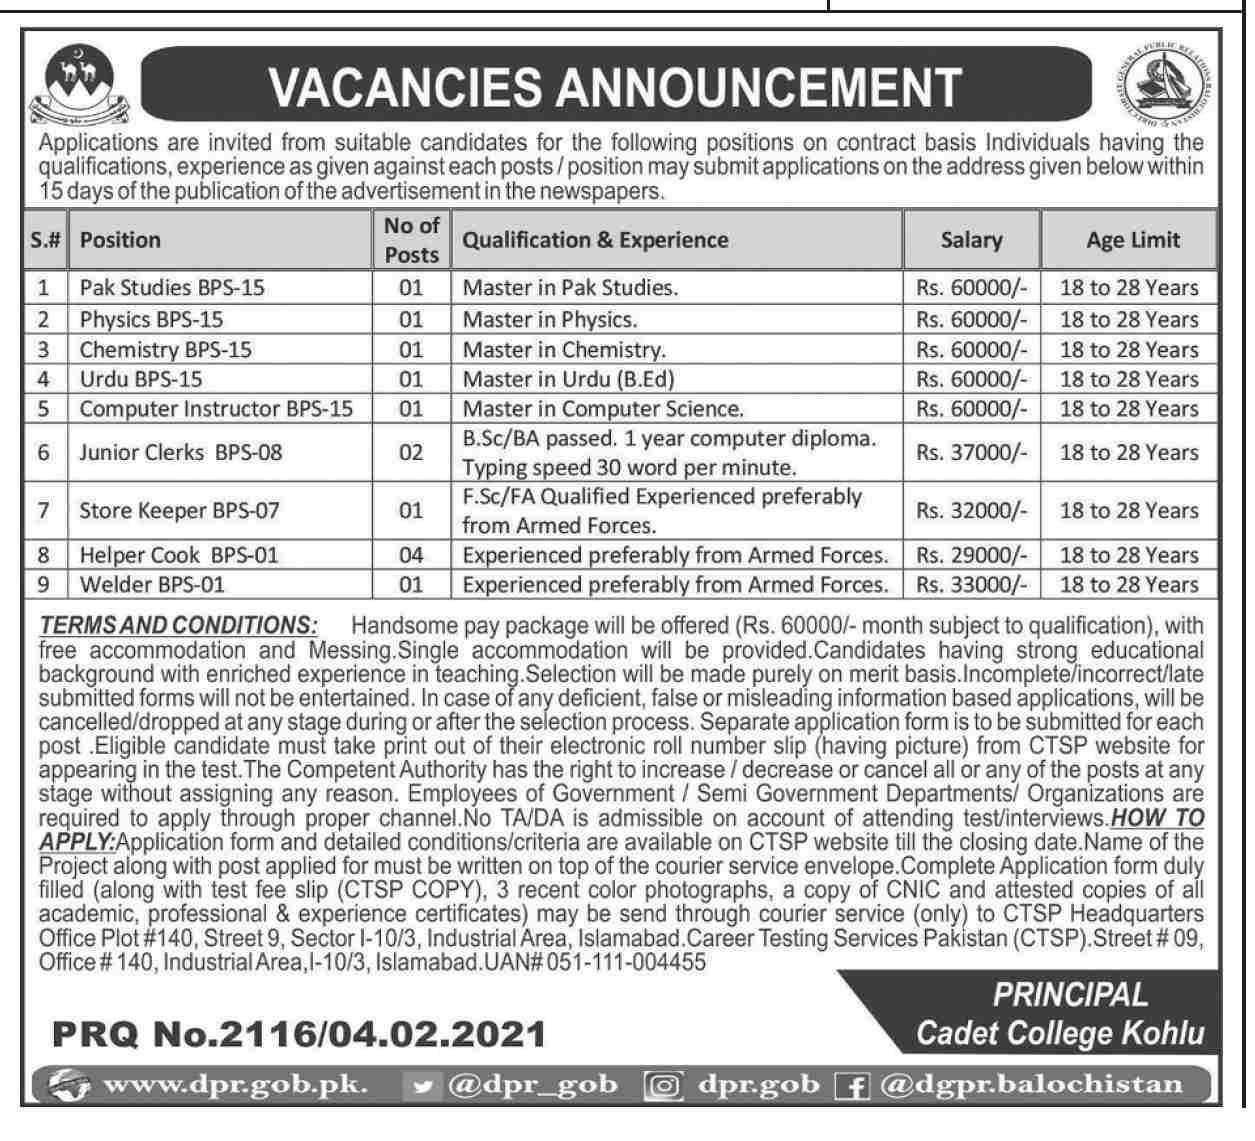 Jobs in Balochistan 2021 - Govt Cadet College Jobs 2021 - Govt Teaching Jobs 2021